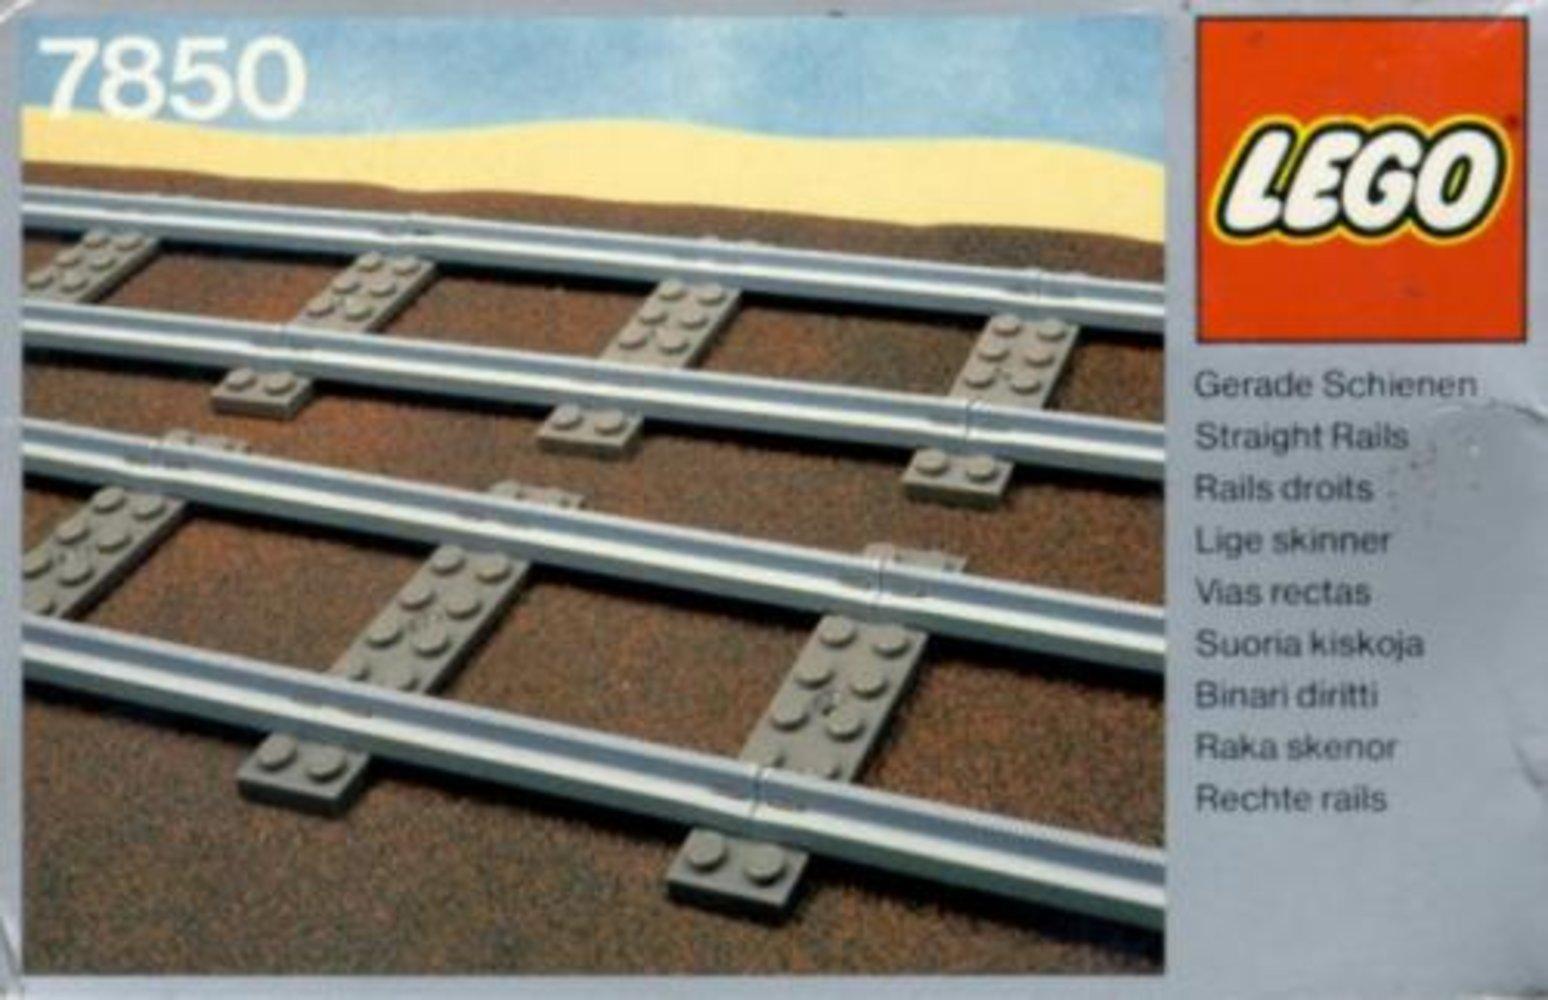 8 Straight Rails Gray 4.5v